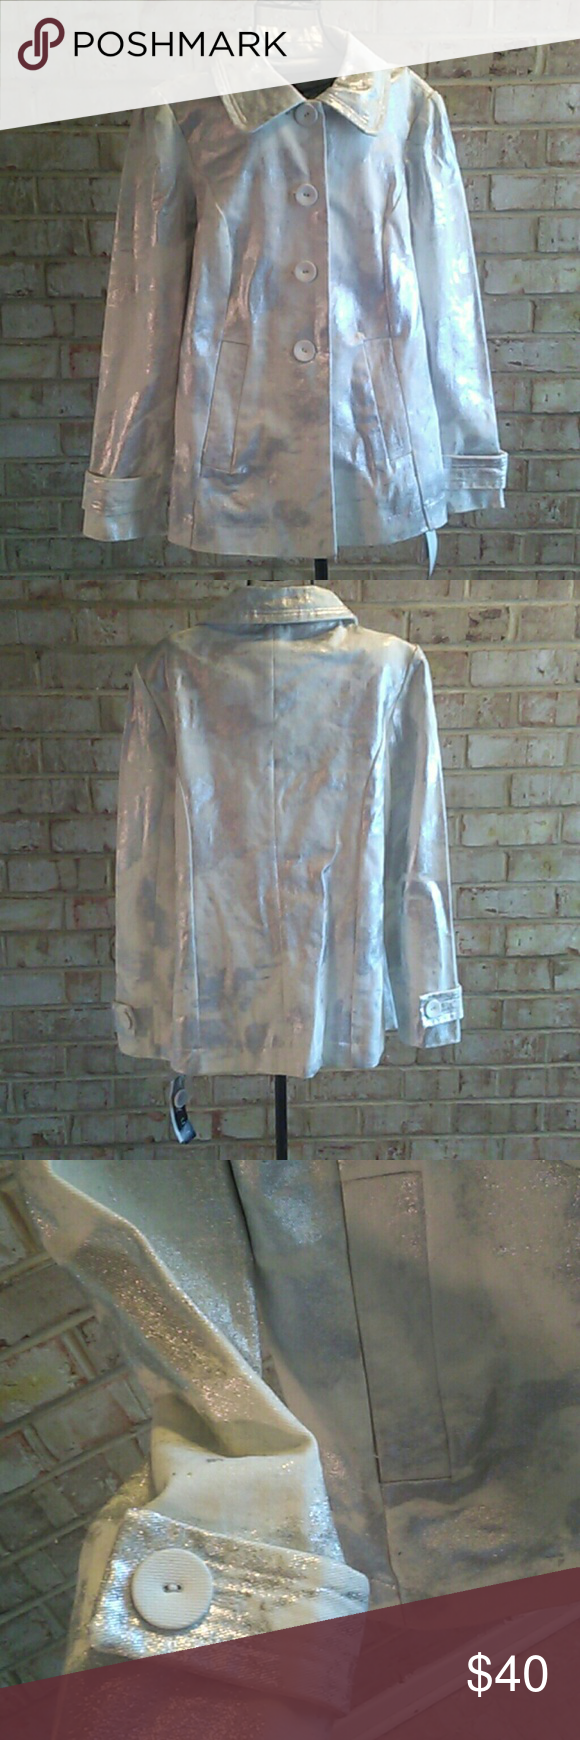 JACKET WHITE AND SILVER JACKET REVUE Jackets & Coats